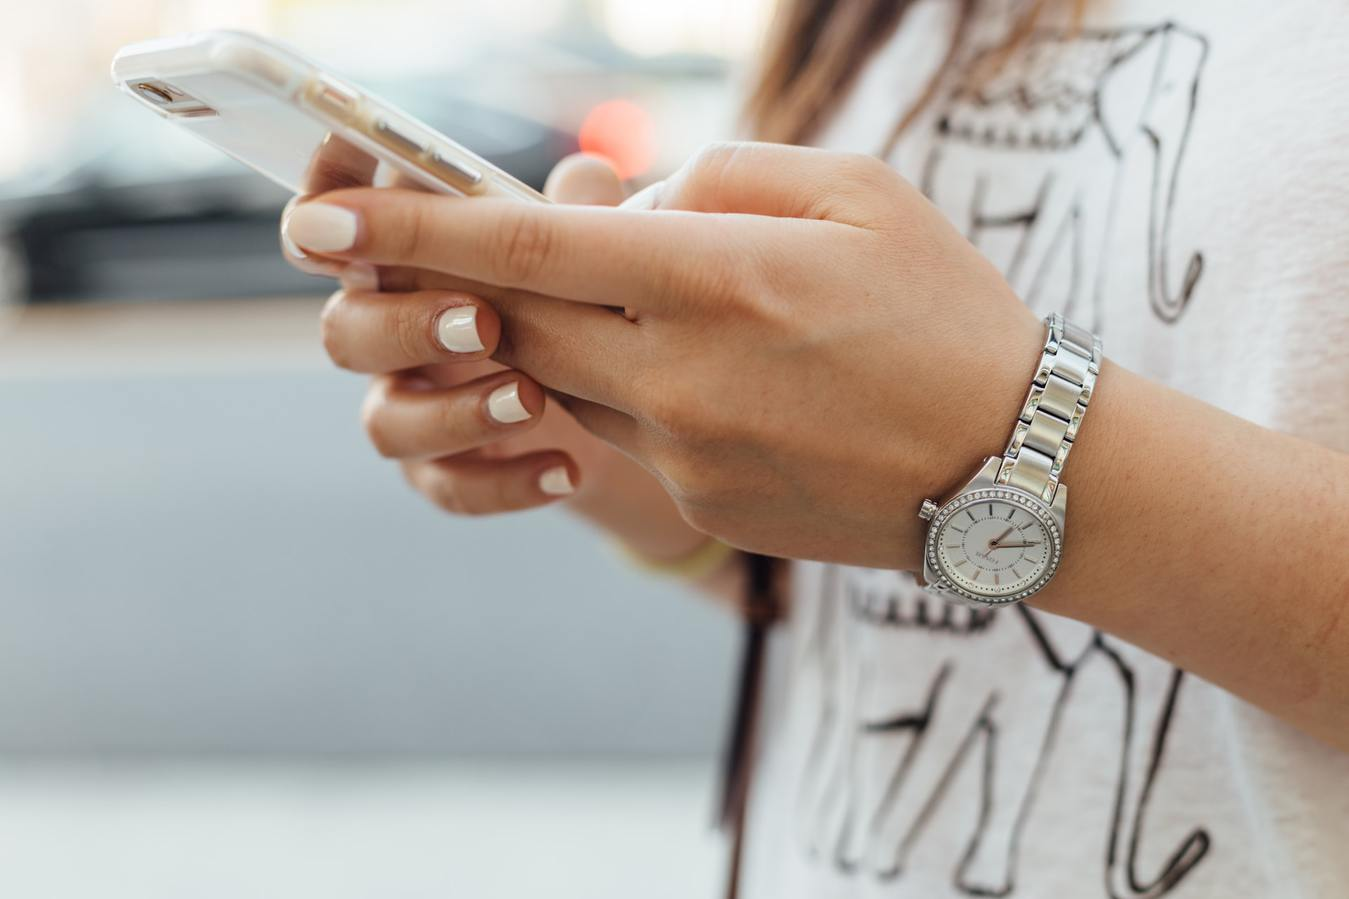 mujer sosteniendo un teléfono inteligente con un reloj de muñeca